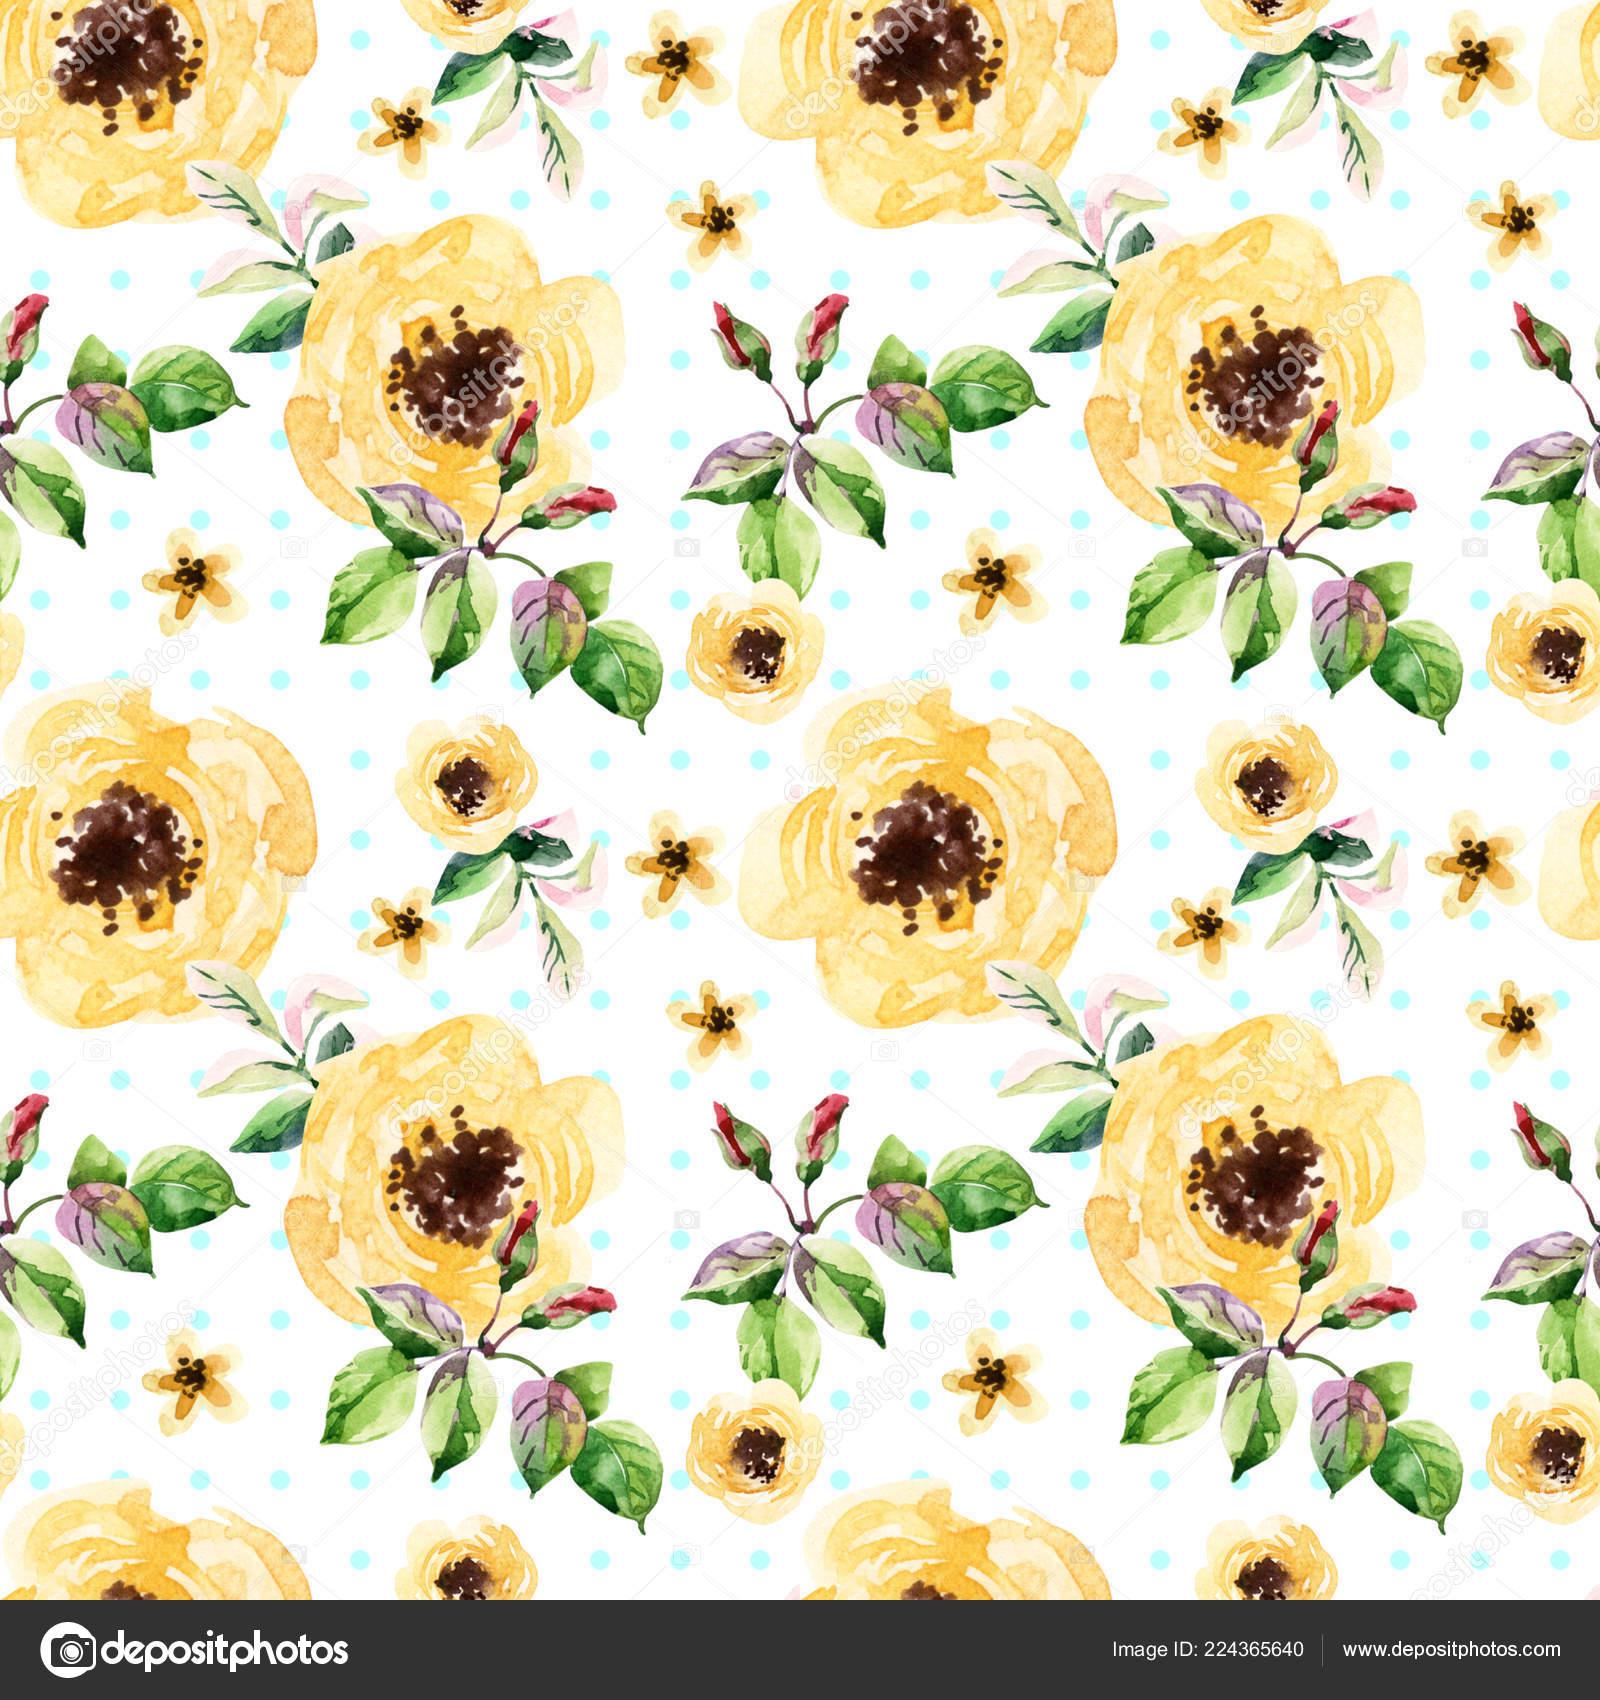 pale yellow flowers polka dot background watercolor meadow herbs leaves stock photo c tetiana syrytsyna 224365640 https depositphotos com 224365640 stock photo pale yellow flowers polka dot html